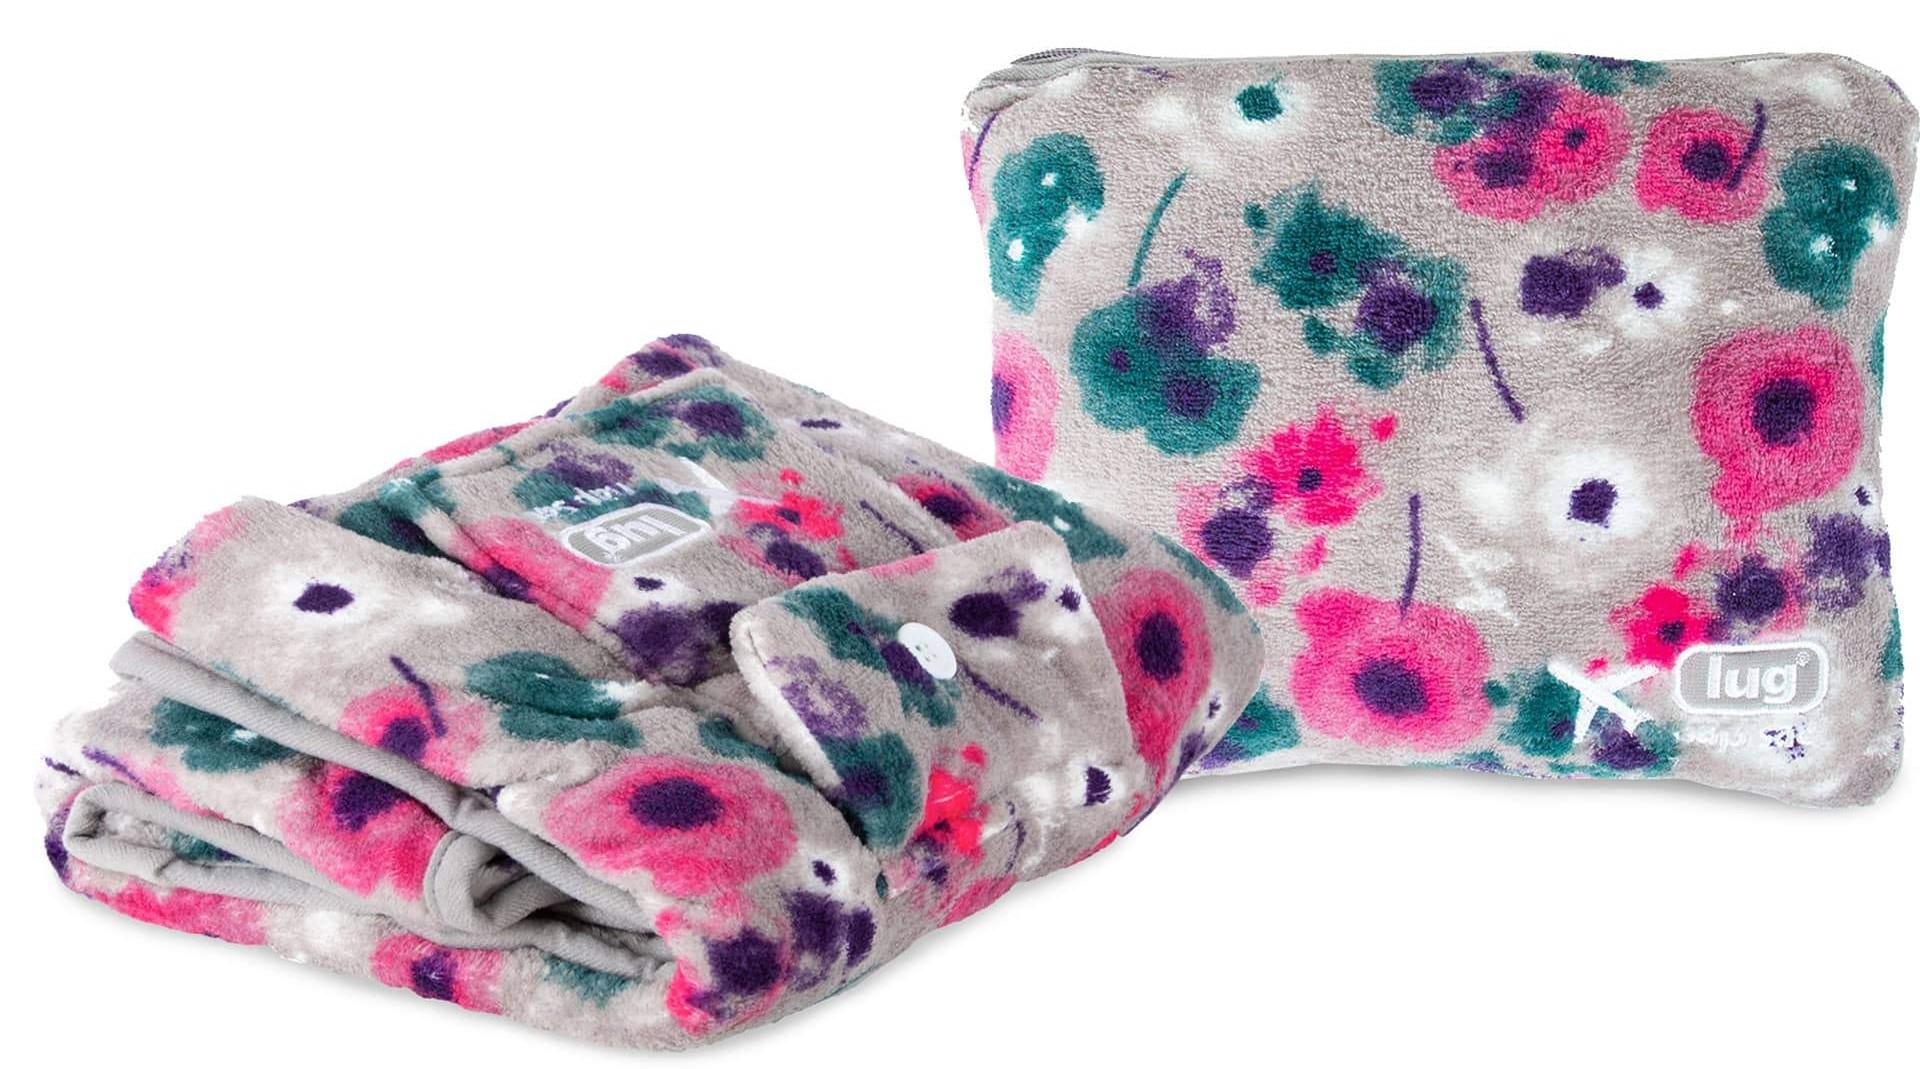 lug nap sac travel pillow blanket watercolor purple